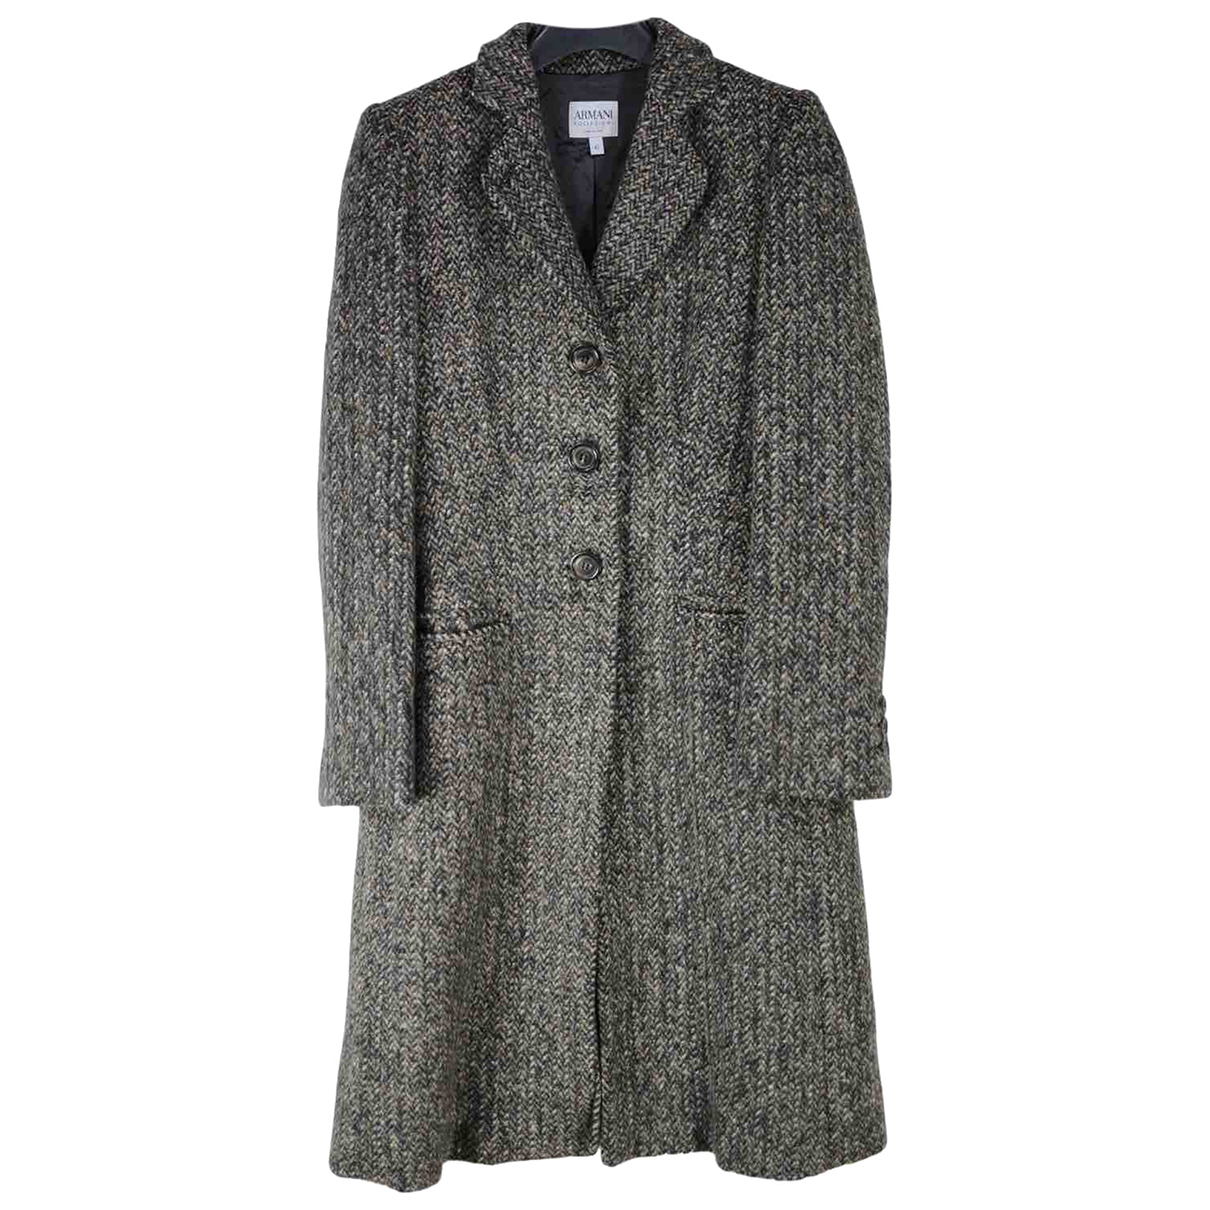 Armani Collezioni N Grey Wool coat for Women 42 IT